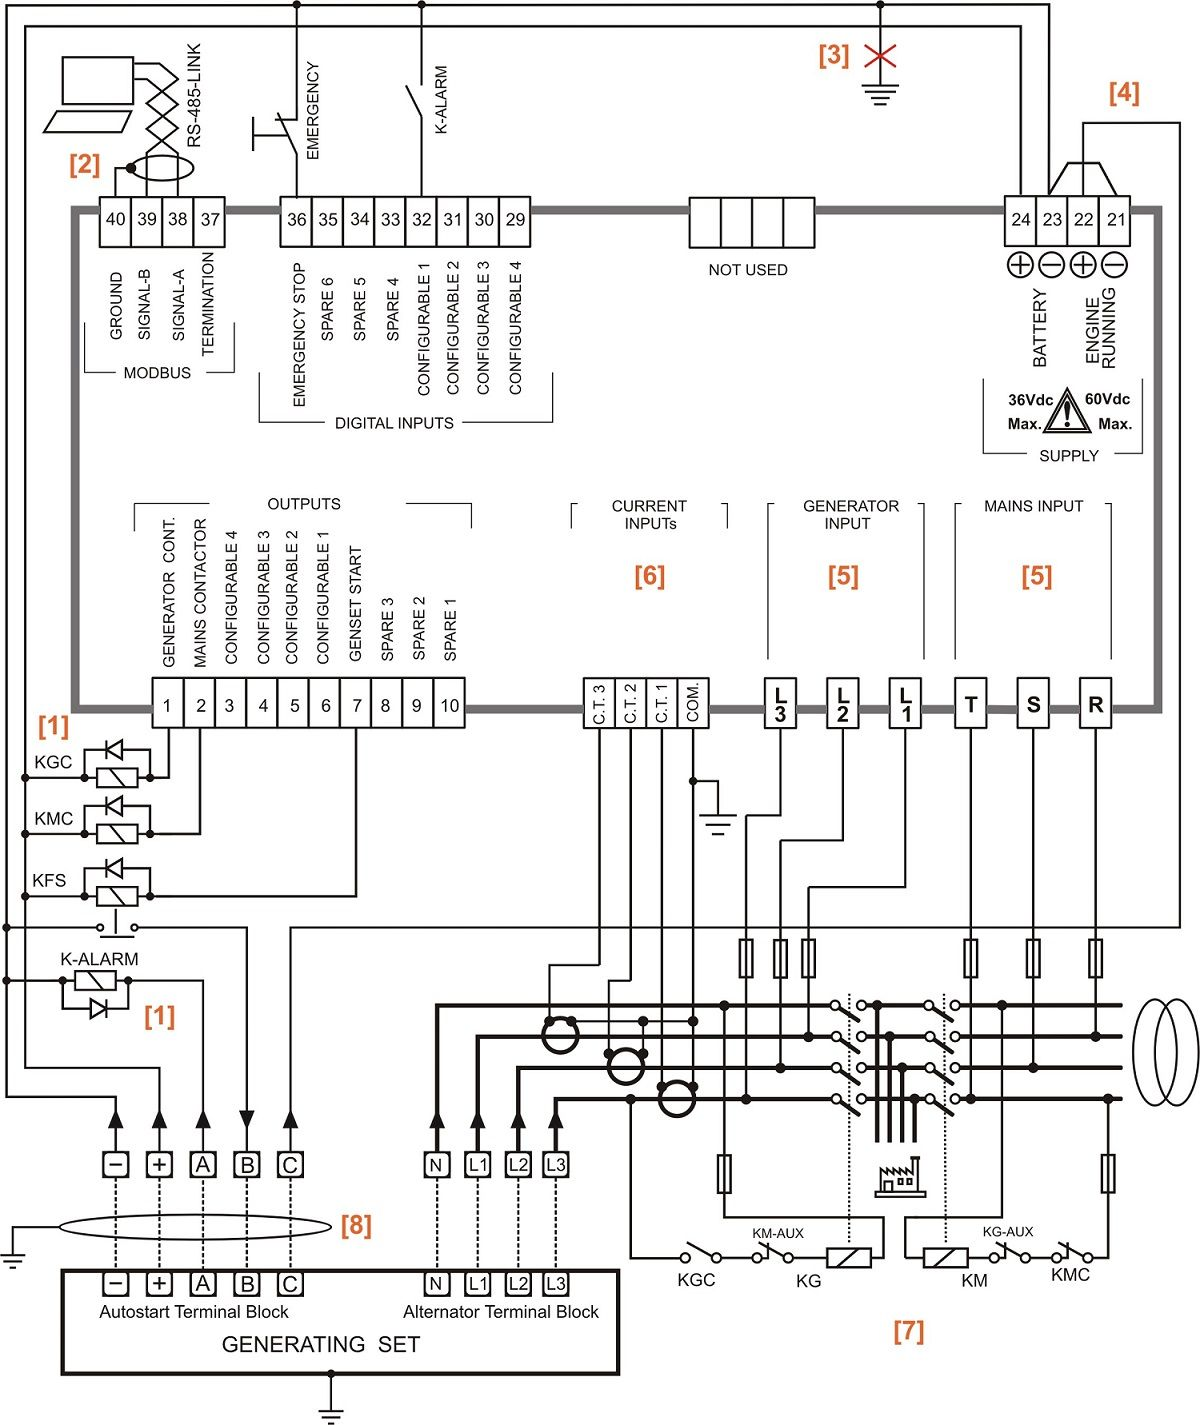 alternator terminal block and engine running for onan generator wiring  schematic : wiring diagr… | esquemas electricos, diagrama de instalacion  electrica, electrica  www.pinterest.ph